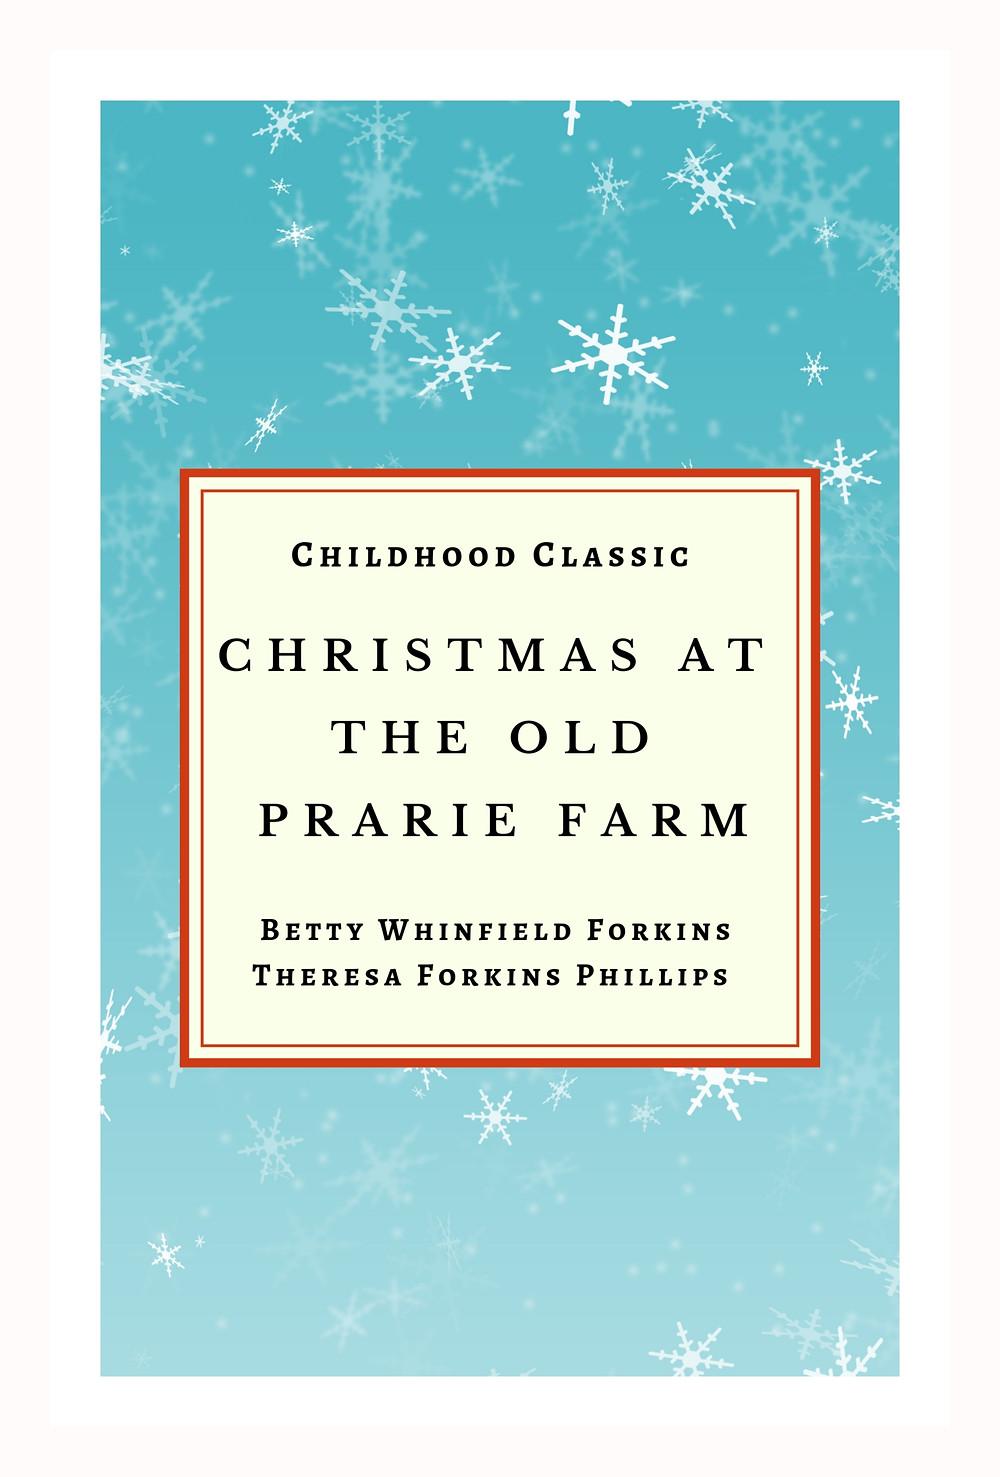 https://www.amazon.com/Christmas-Old-Prairie-Farm-Childhood/dp/1692119877/ref=sr_1_1?keywords=Christmas+at+the+old+prairie+farm&qid=1568485644&sr=8-1